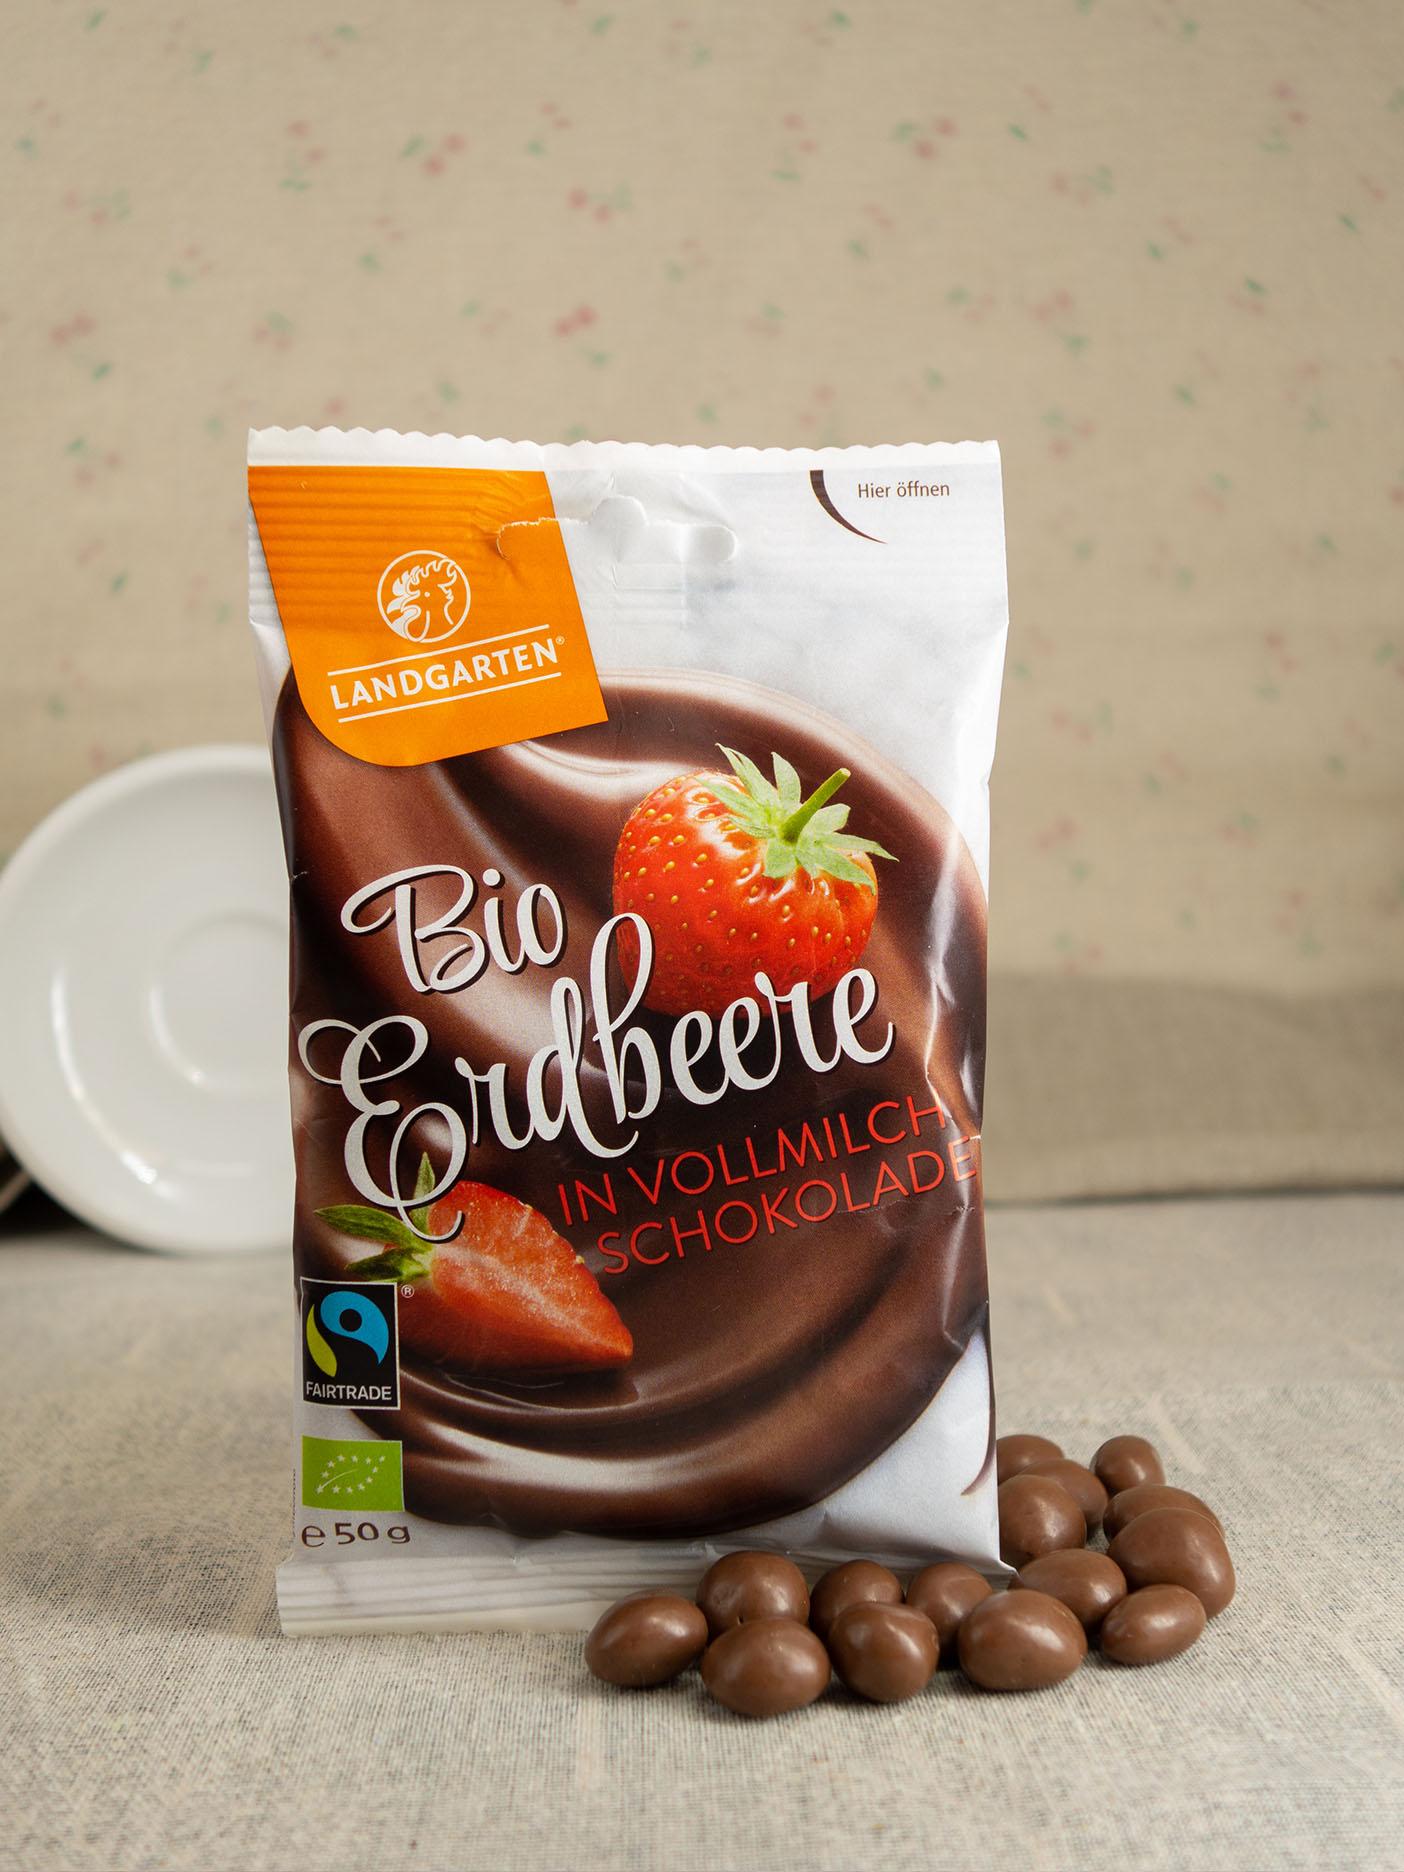 Bio FT Erdbeeren in Vollmilch- und Beeren-Schokolade 50g